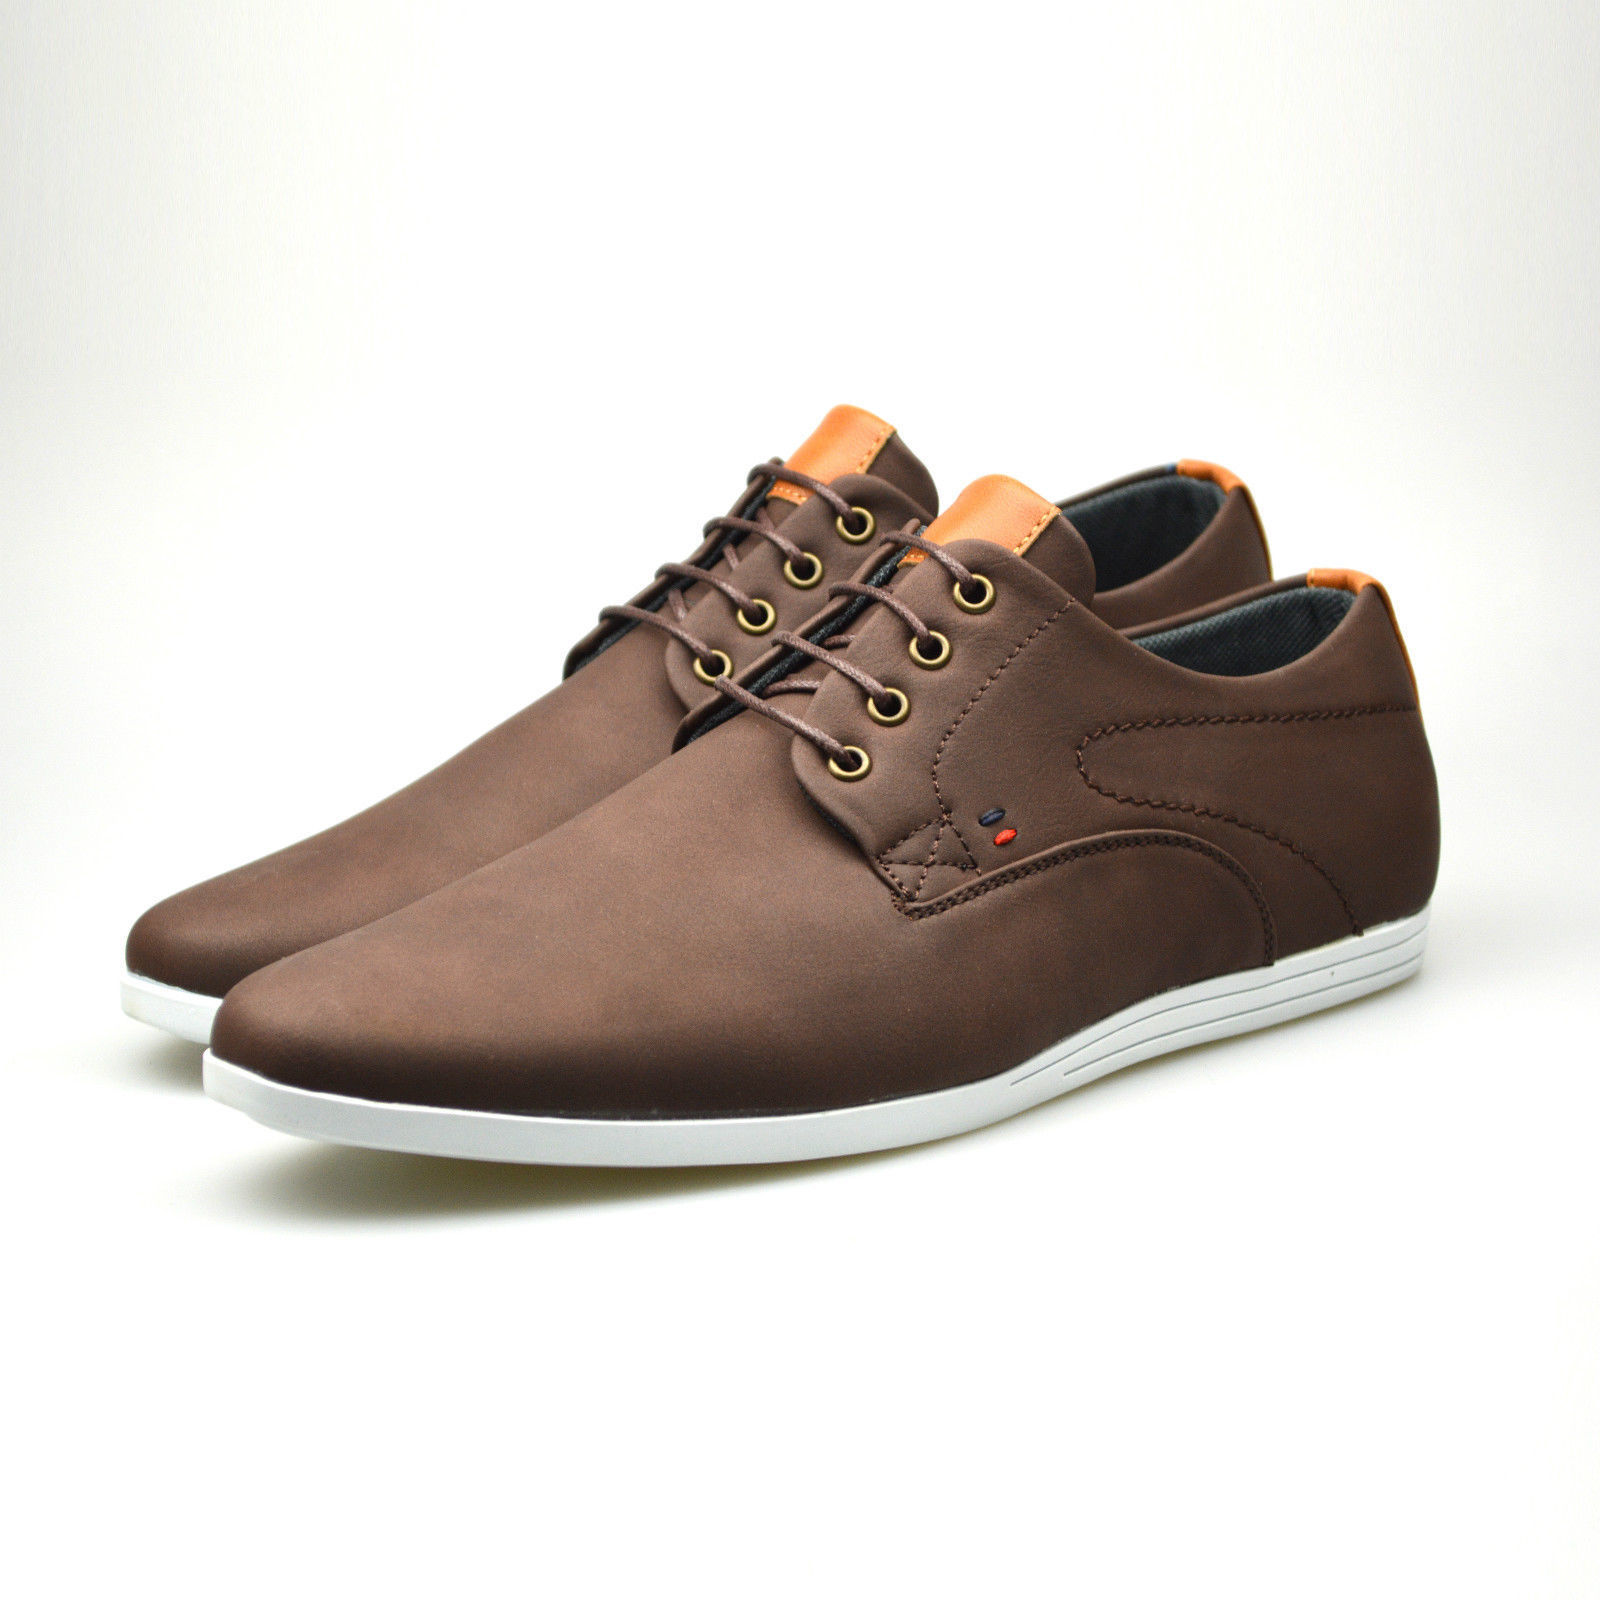 274c26527257 Casual brown dress shoes - phillysportstc.com